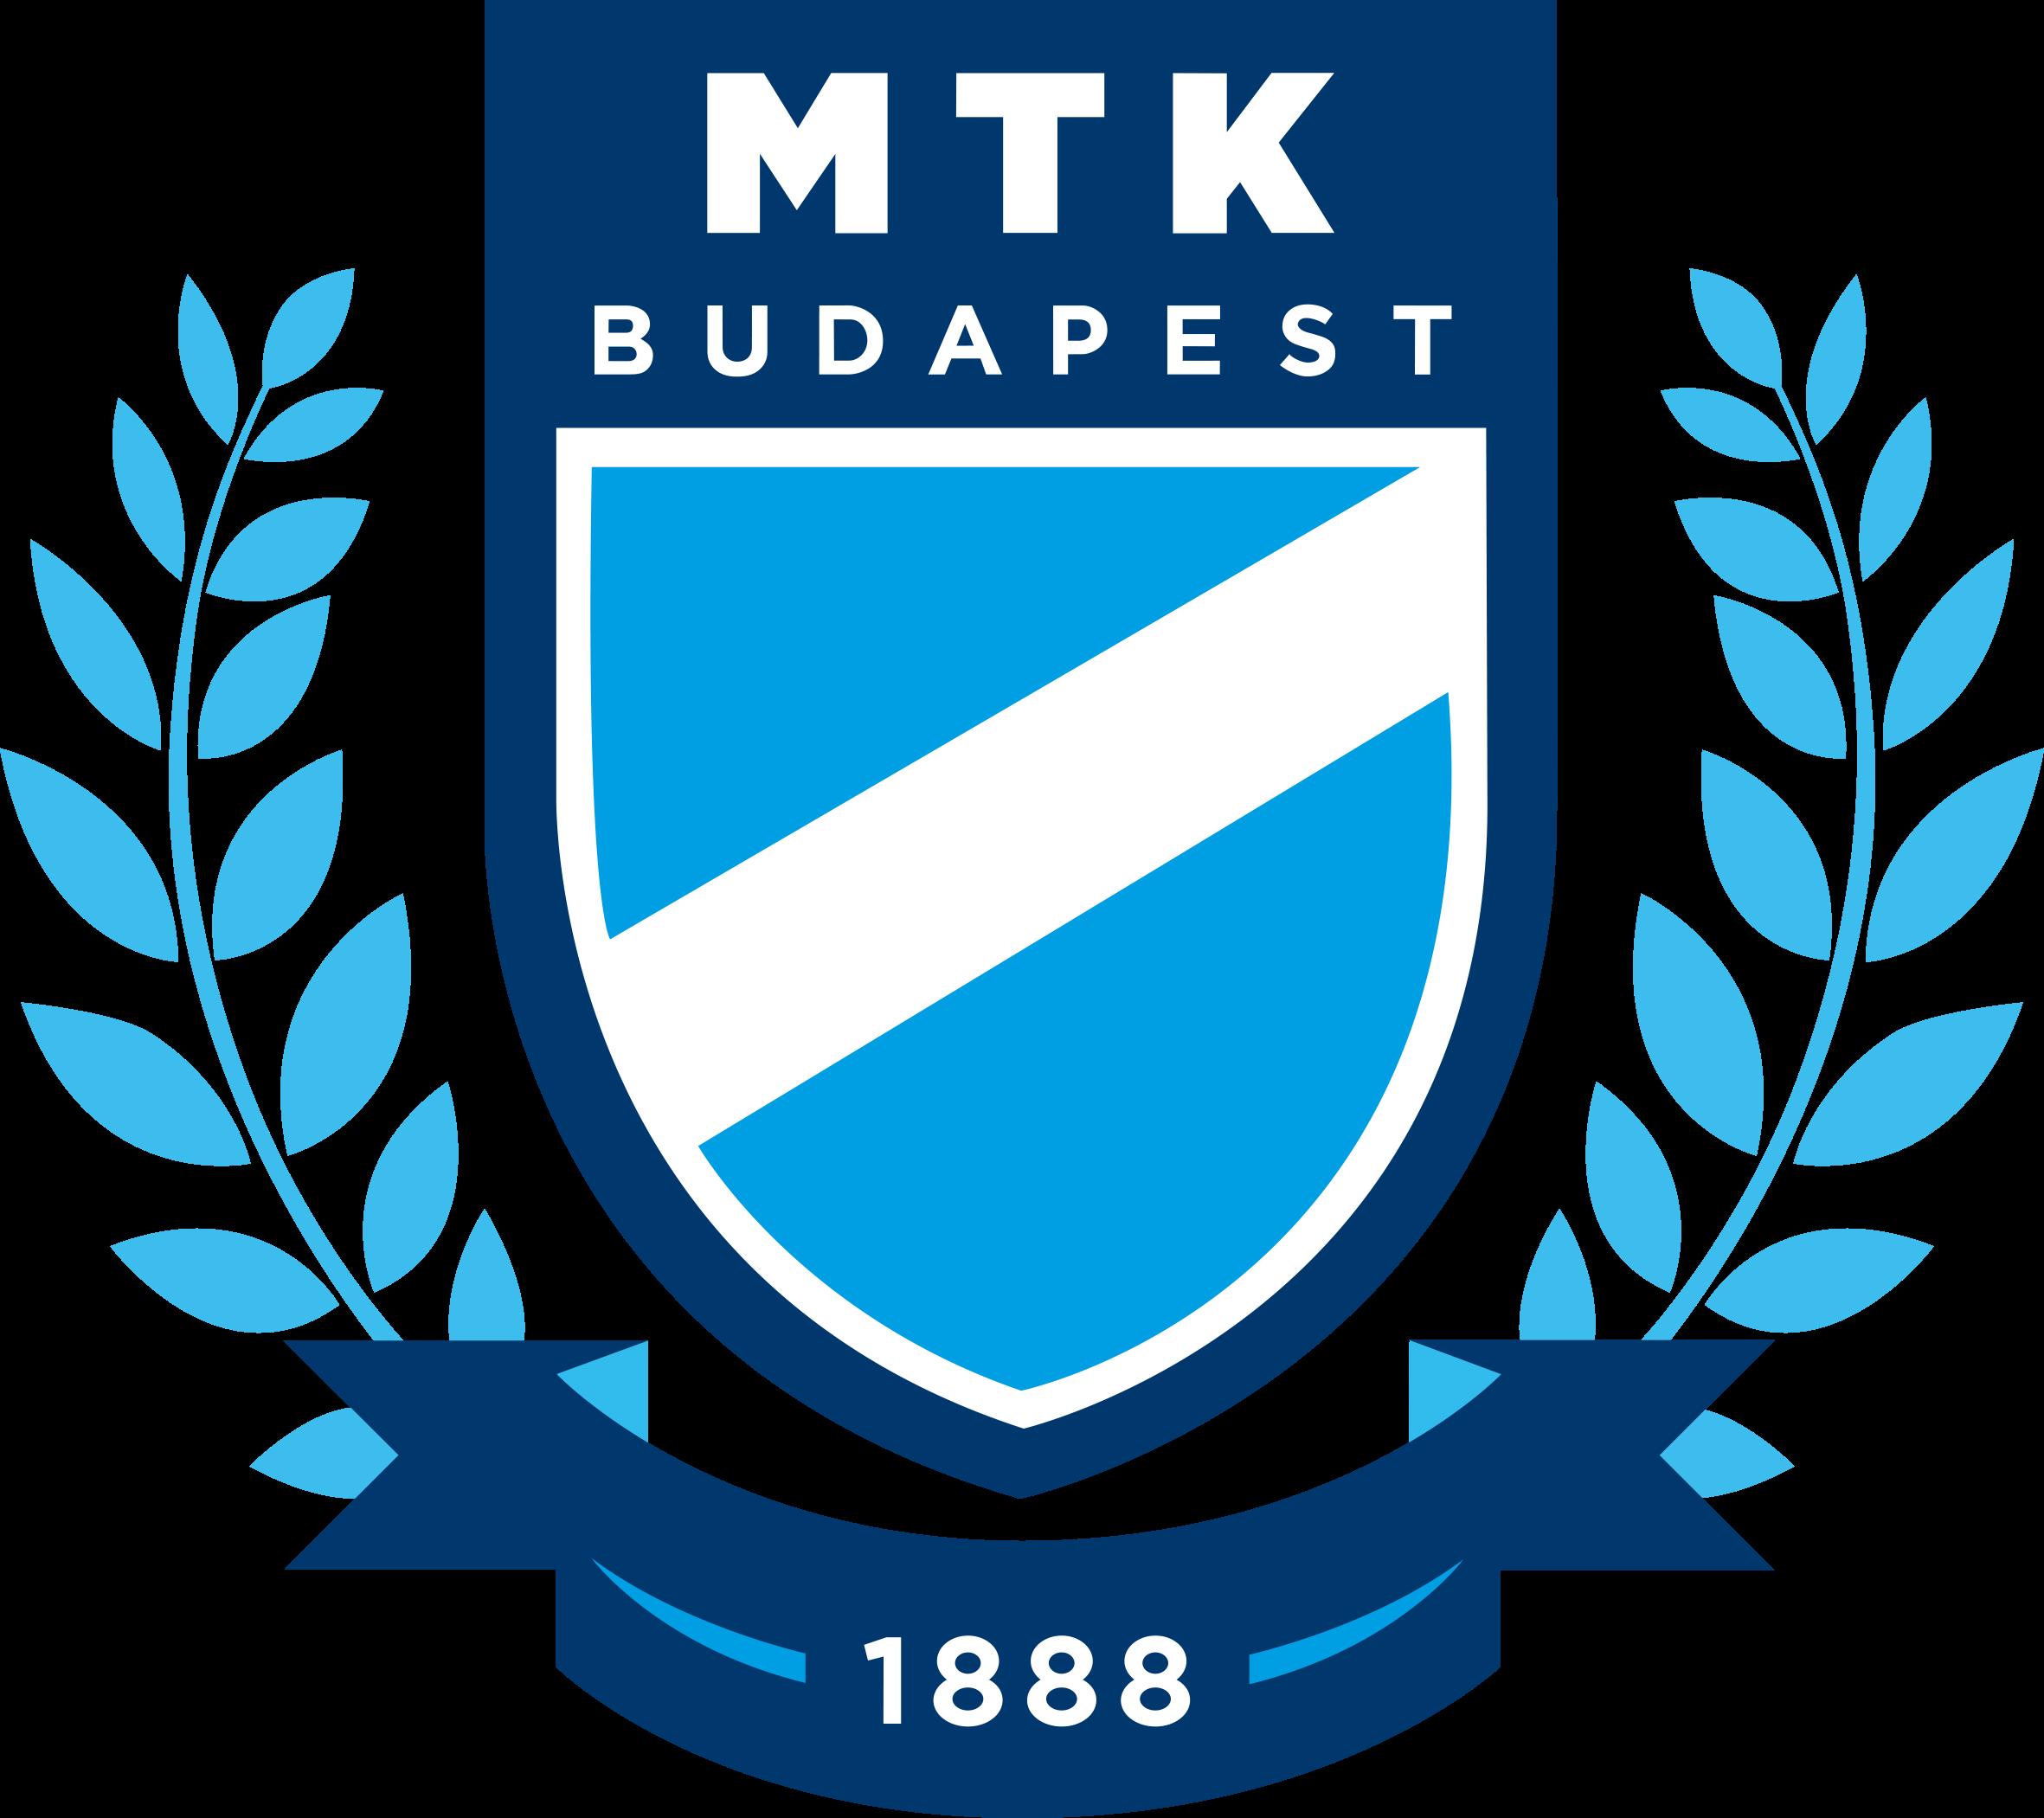 MTK Budapest's logo